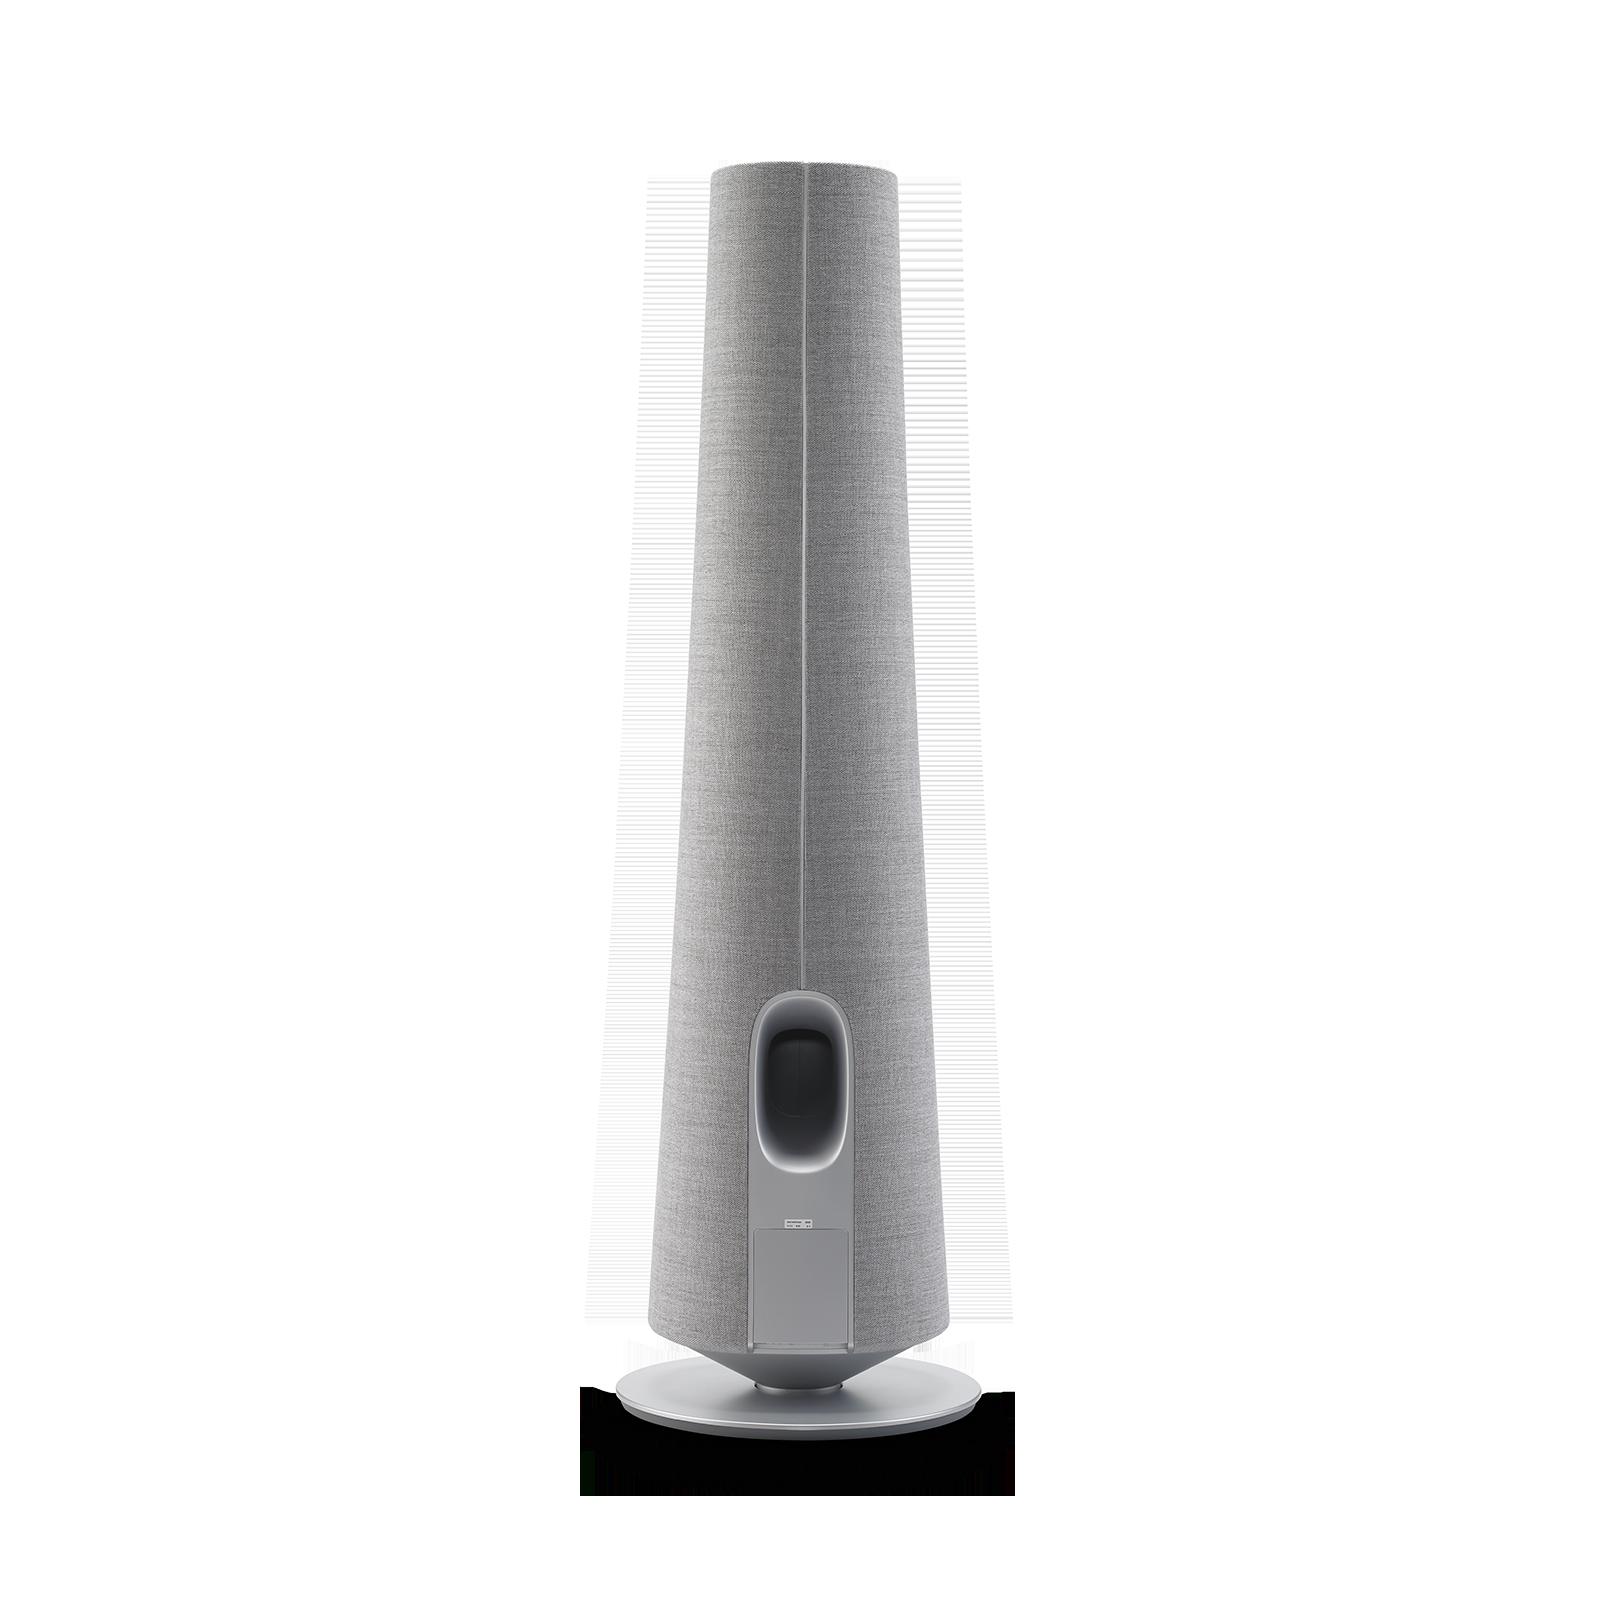 Harman Kardon Citation Tower - Grey - Smart Premium Floorstanding Speaker that delivers an impactful performance - Back